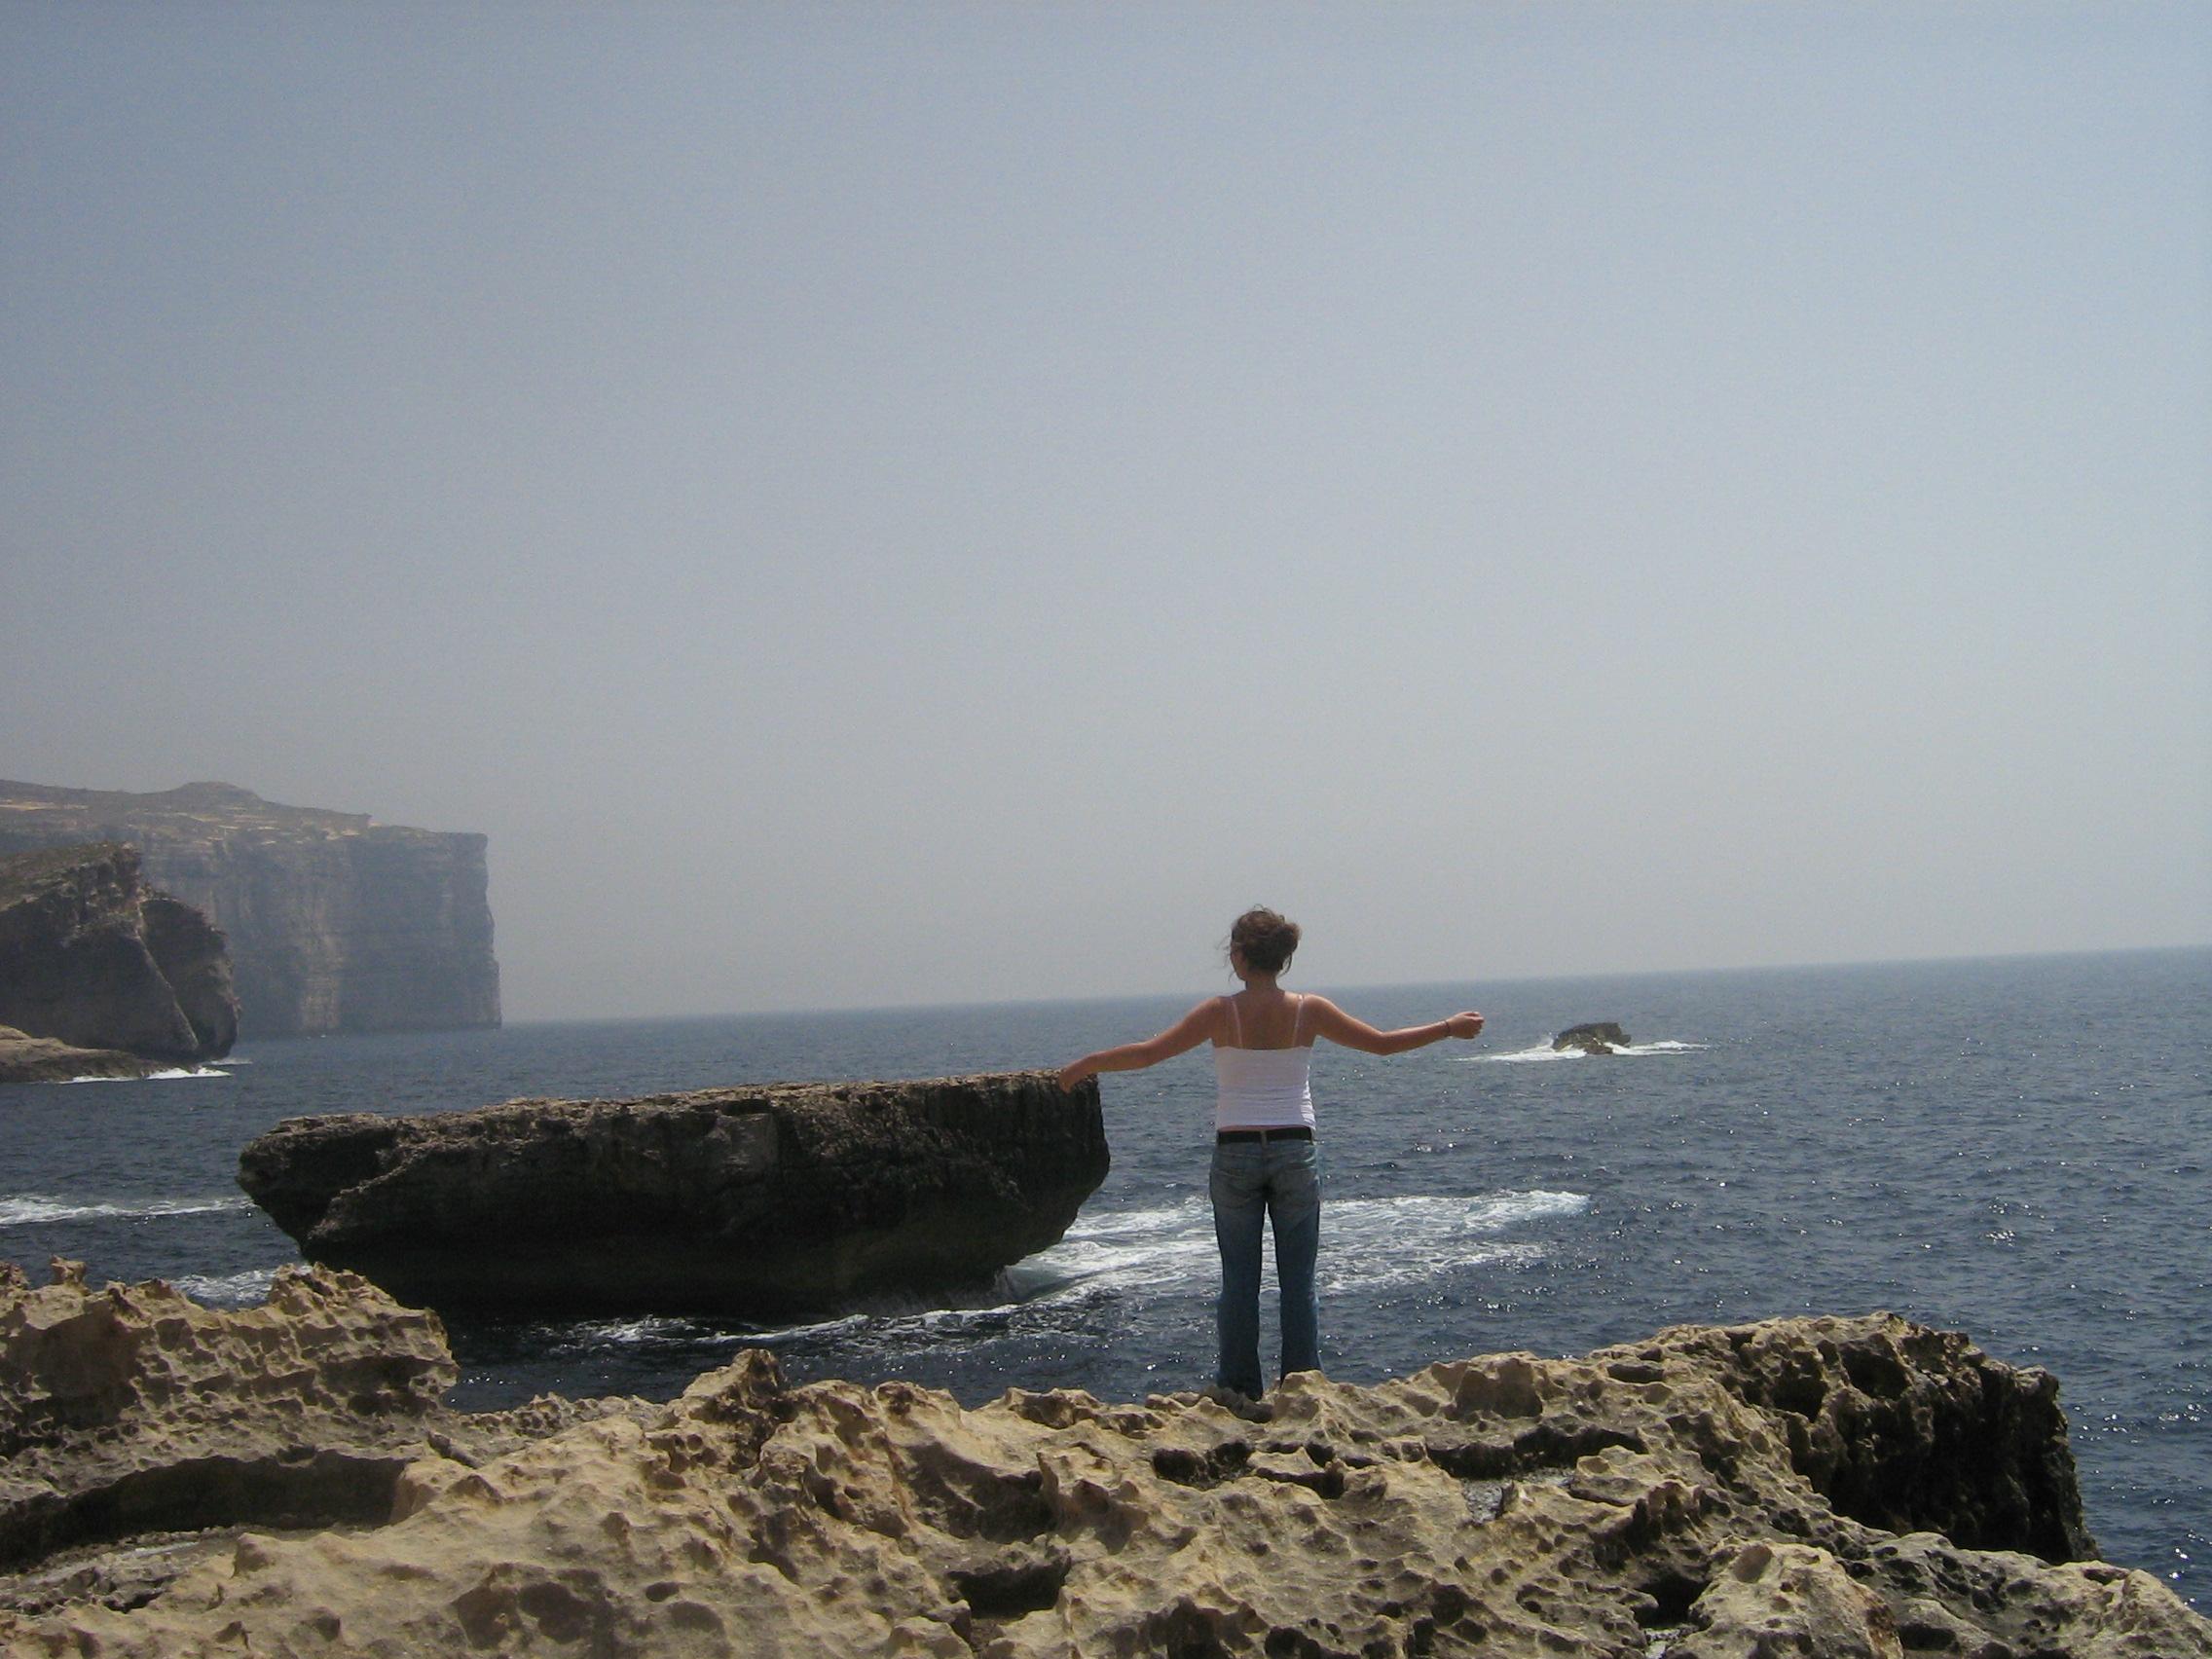 Coastline Malta Island